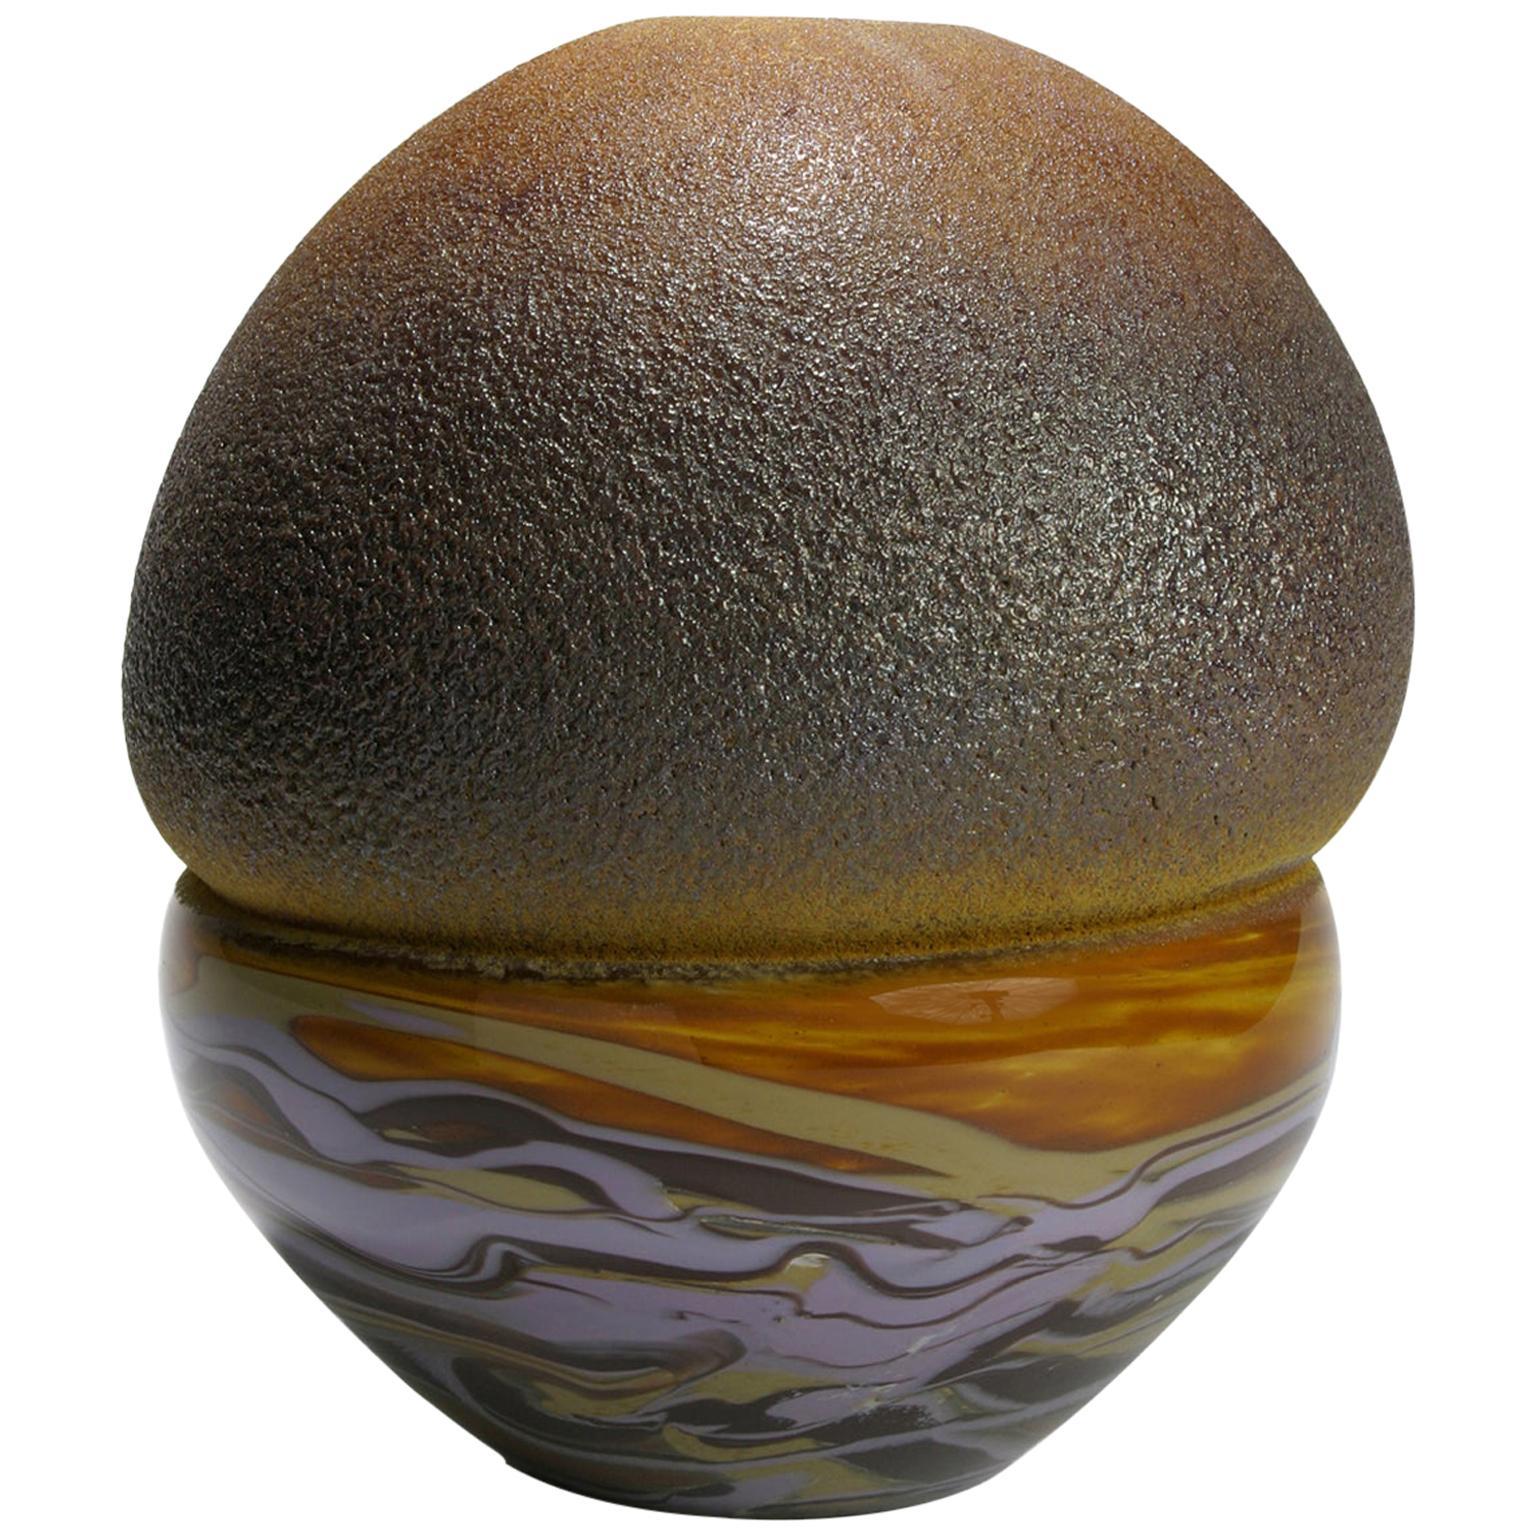 Glass object. Marble Beydik, Hand Blown Object, African Ceramic Inspiration.